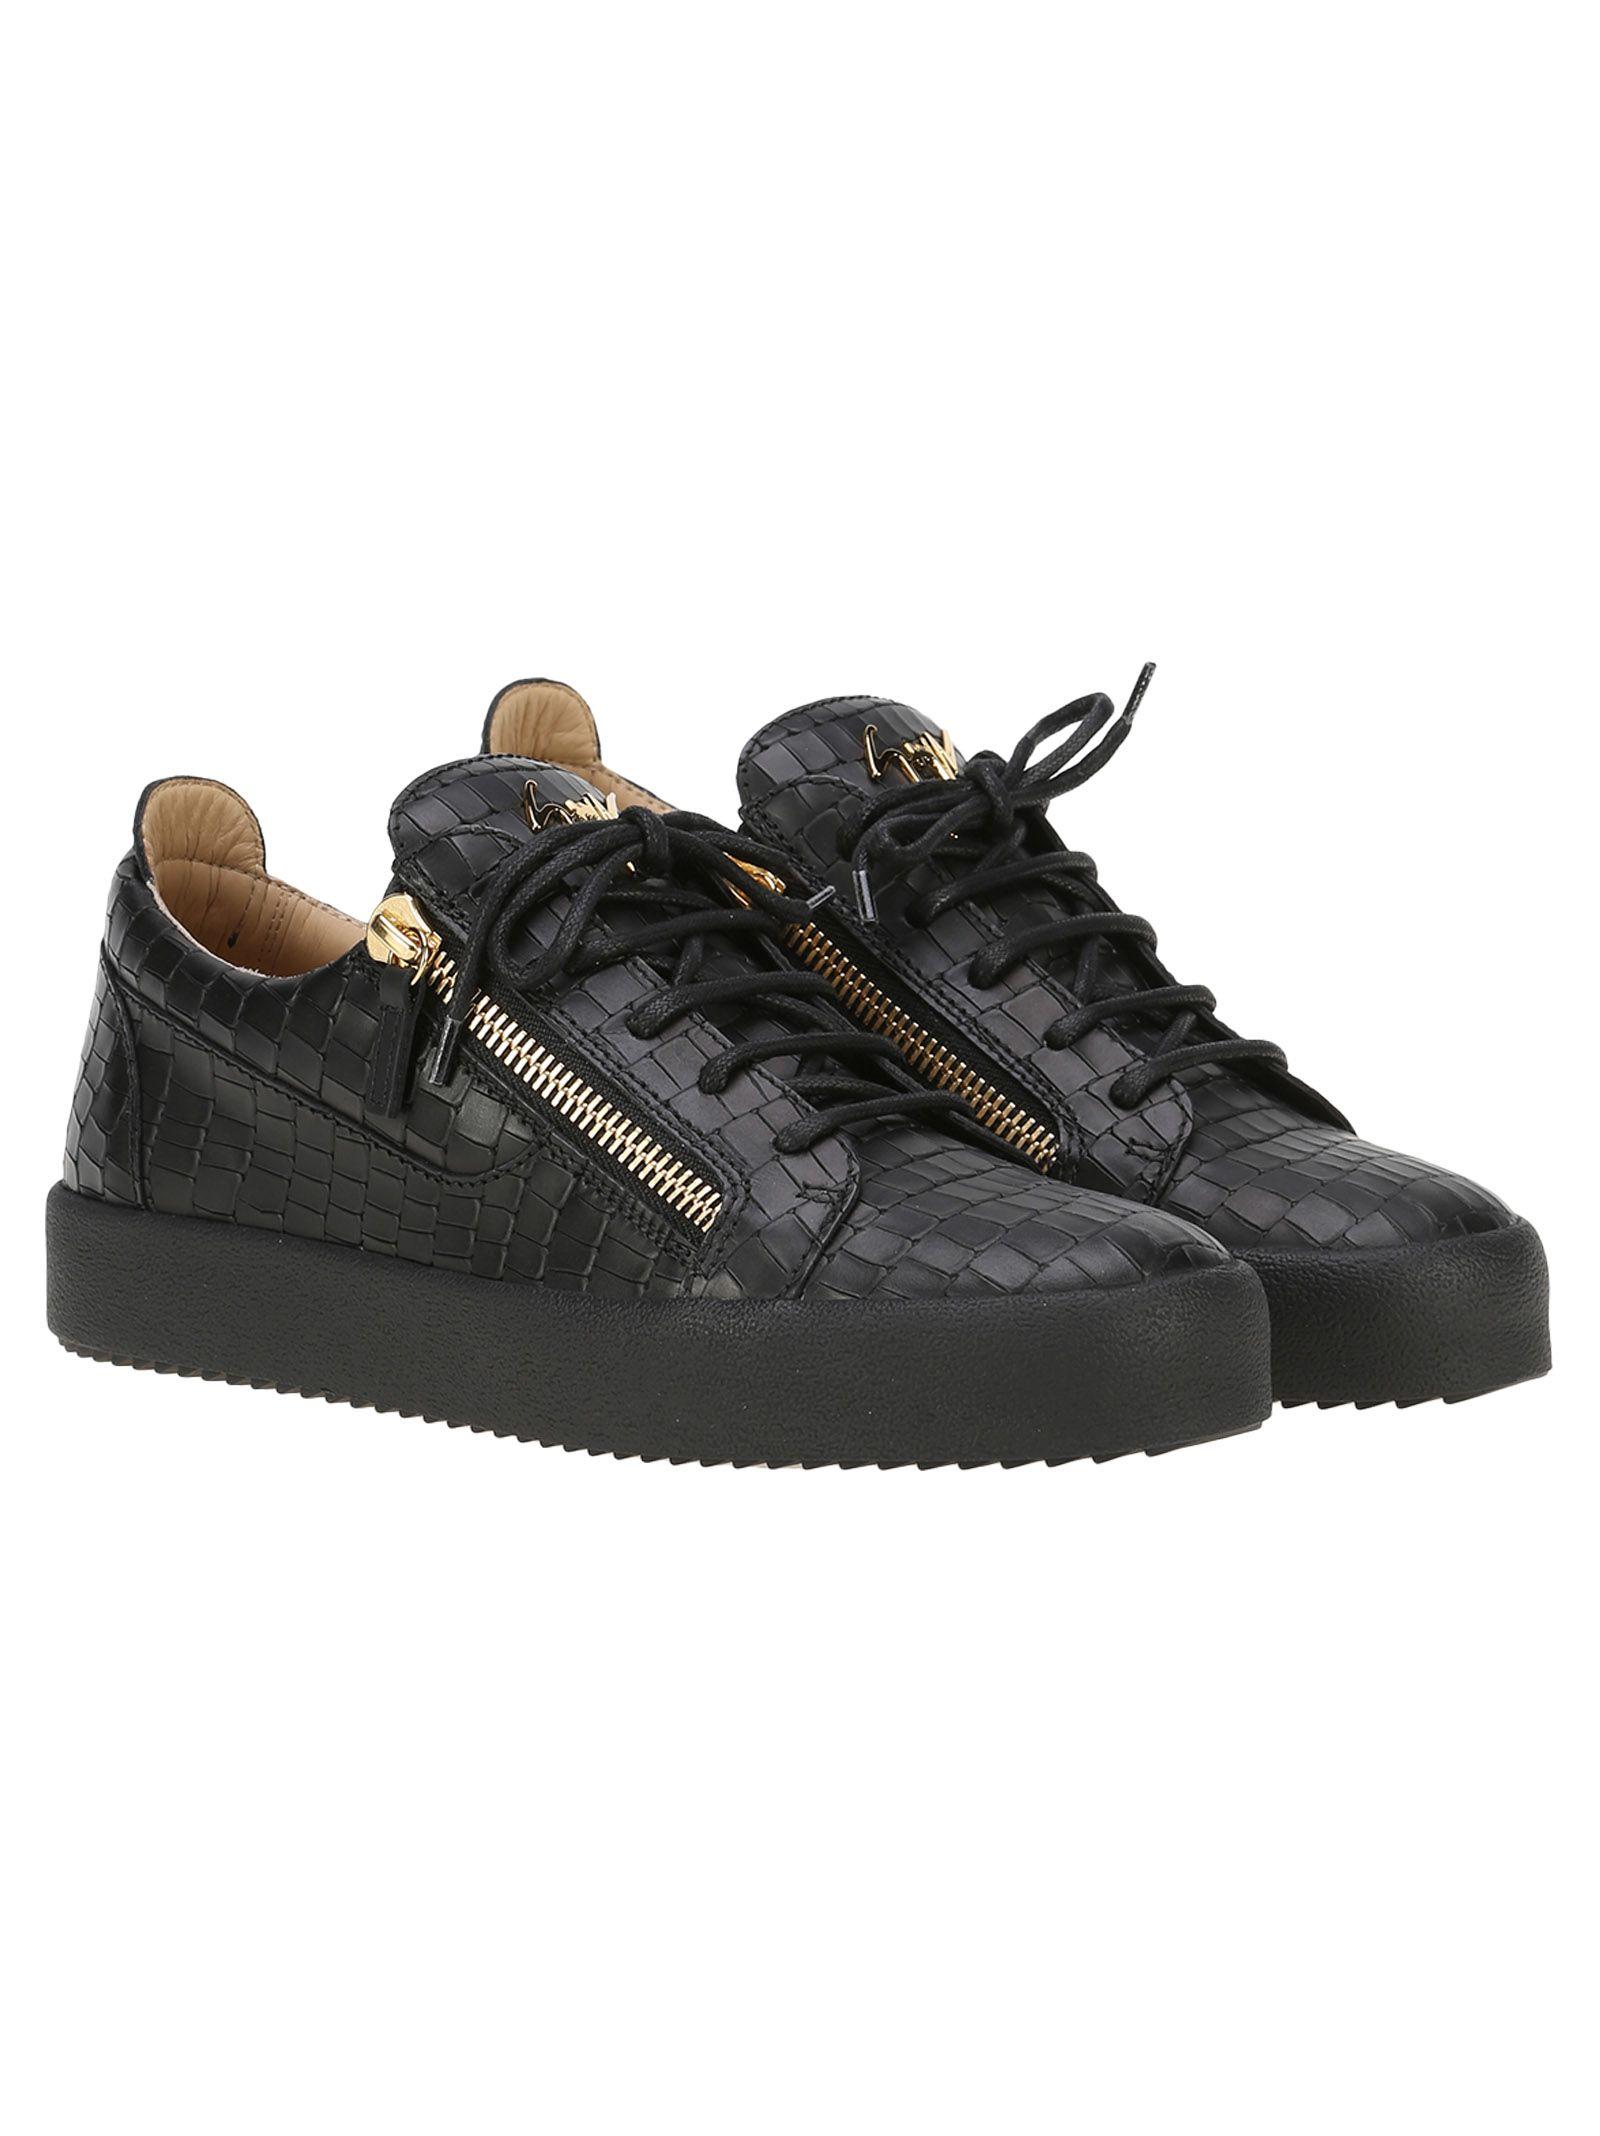 Giuseppe Zanotti Design Frankie Croc Sneakers